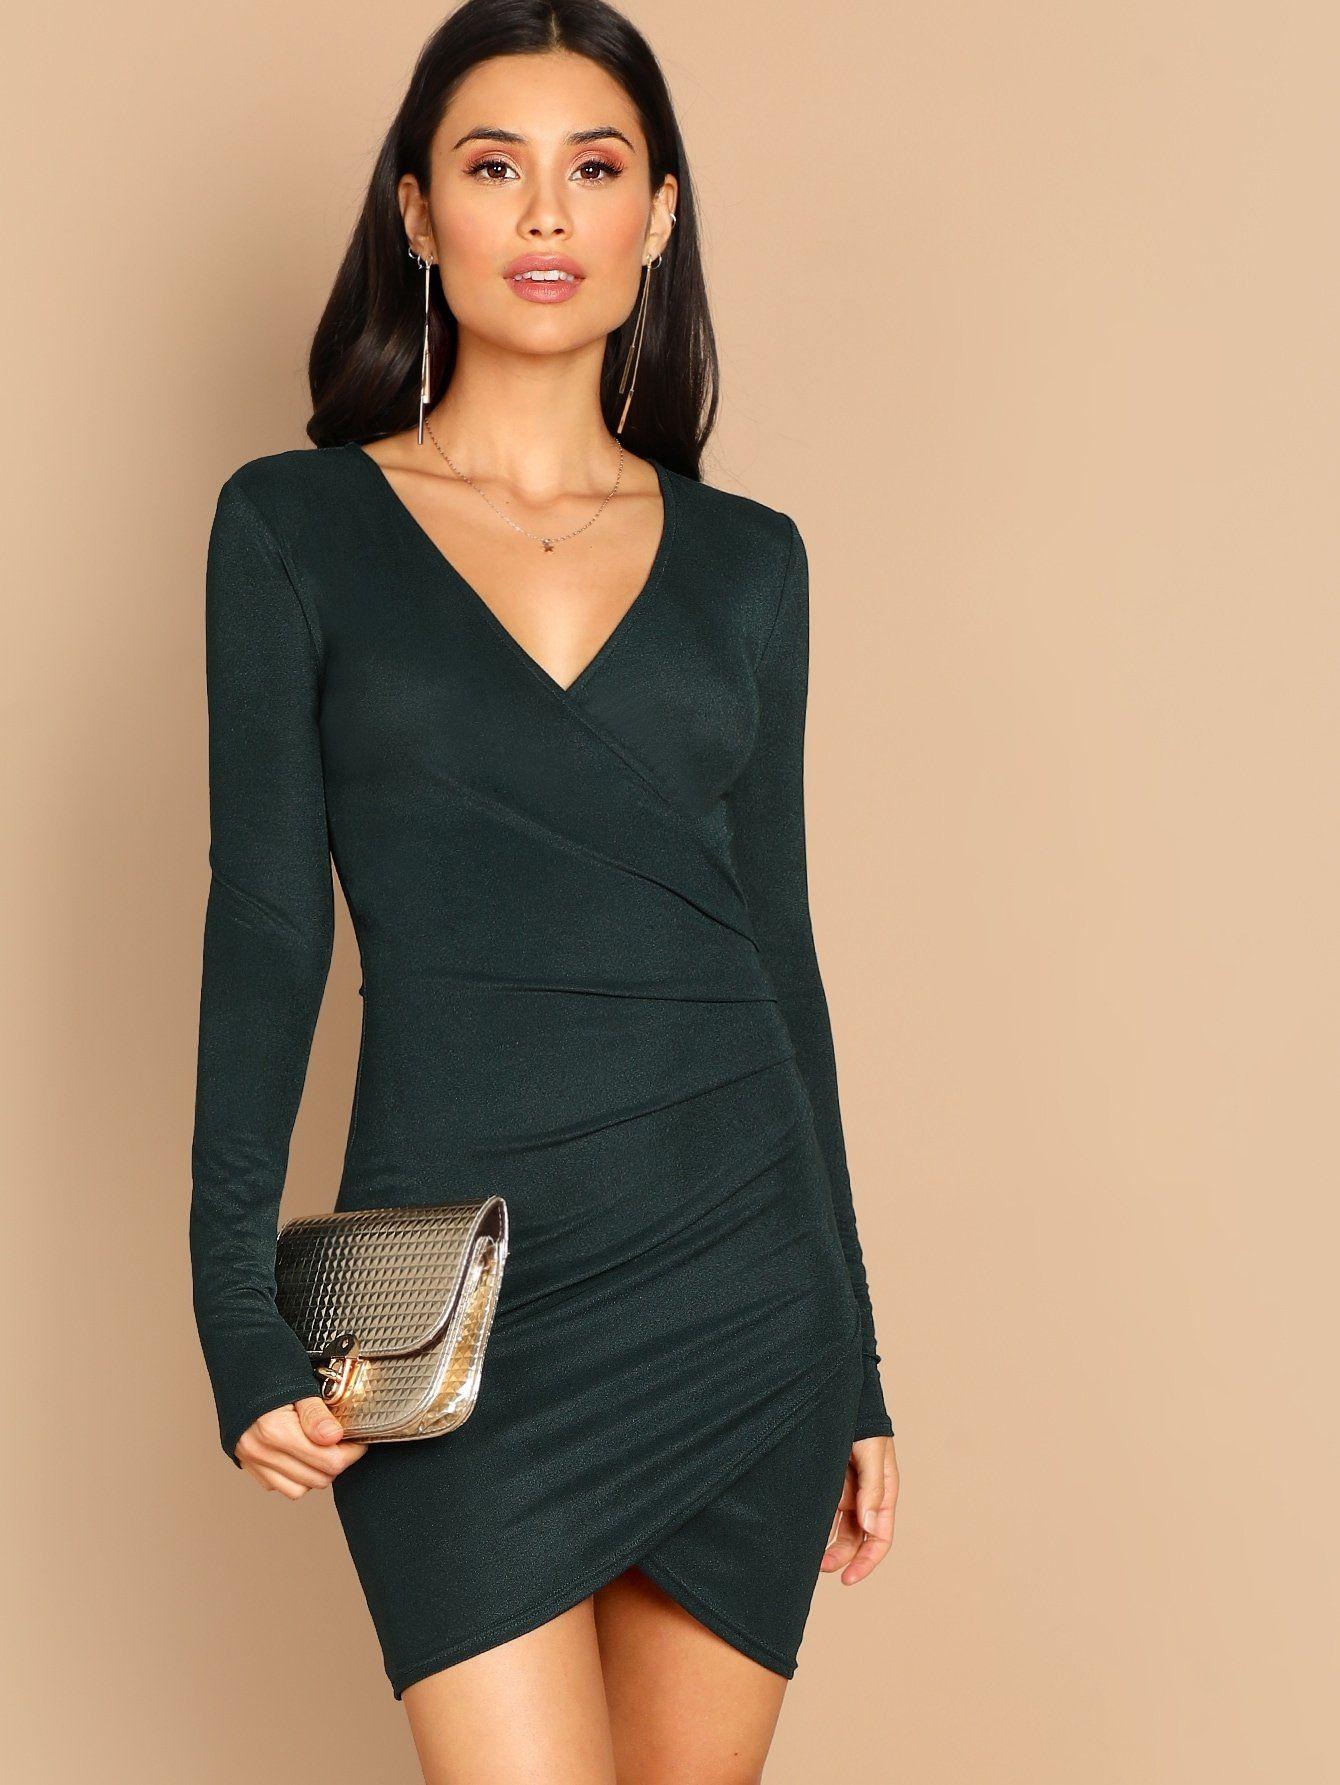 da8a5af395 Ruched Wrap Bodycon Dress | Products | Pinterest | Bodycon Dress ...